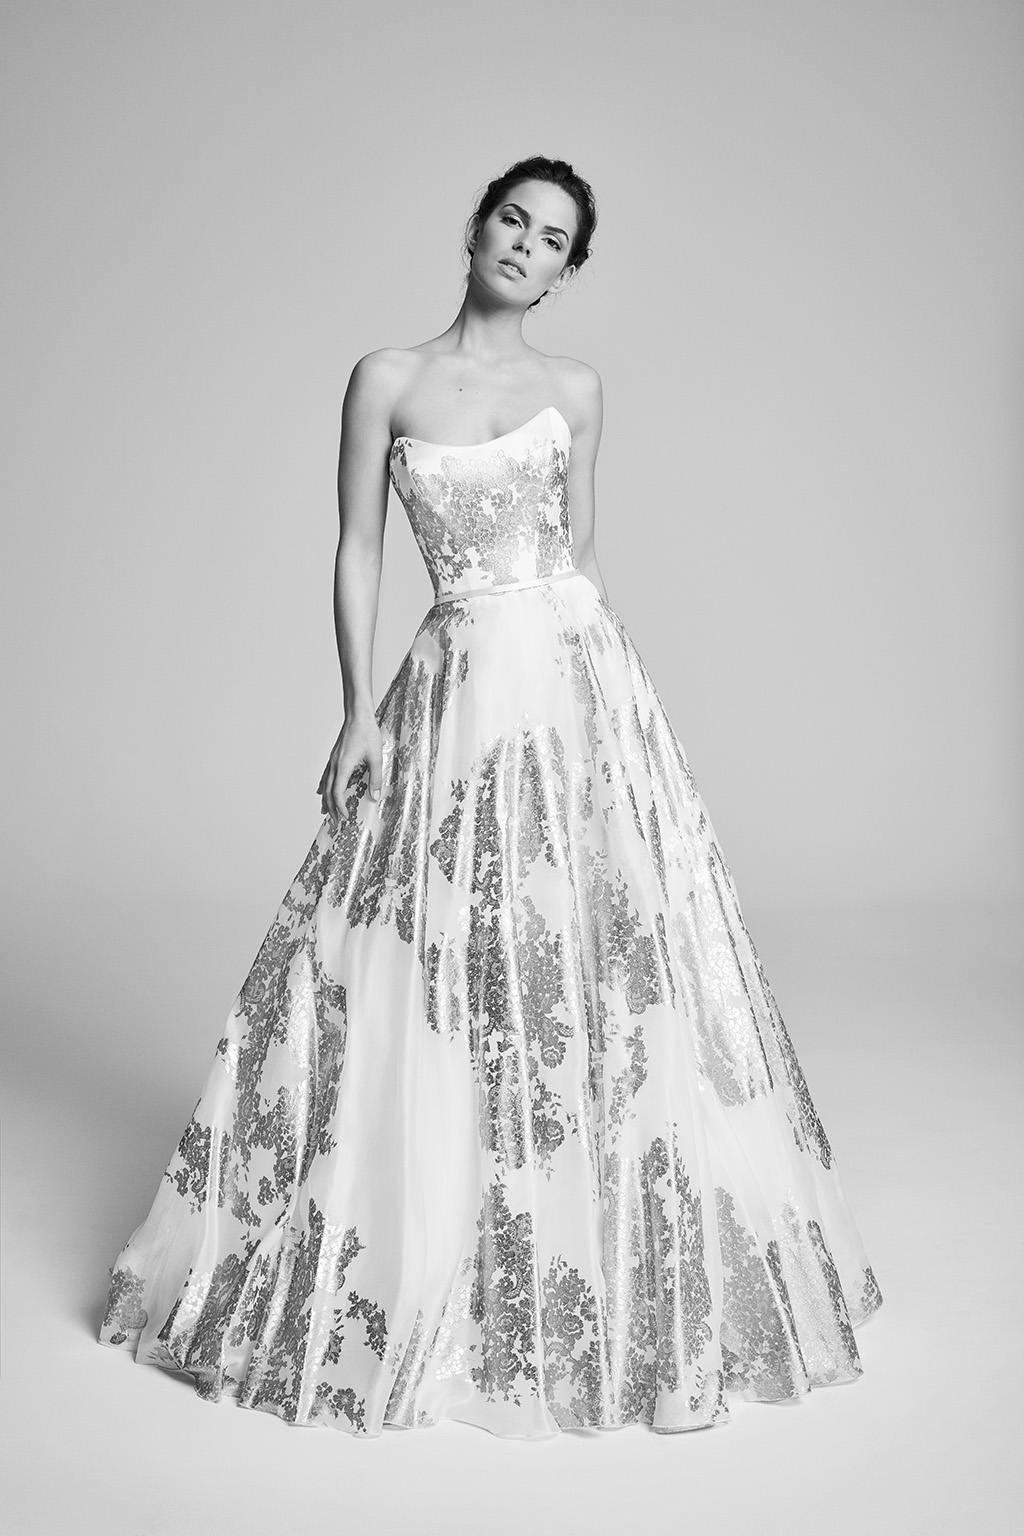 nazarene-bridalcouture-wedding-dresses-uk-belle-epoque-collection-2018-by-designer-suzanne-neville